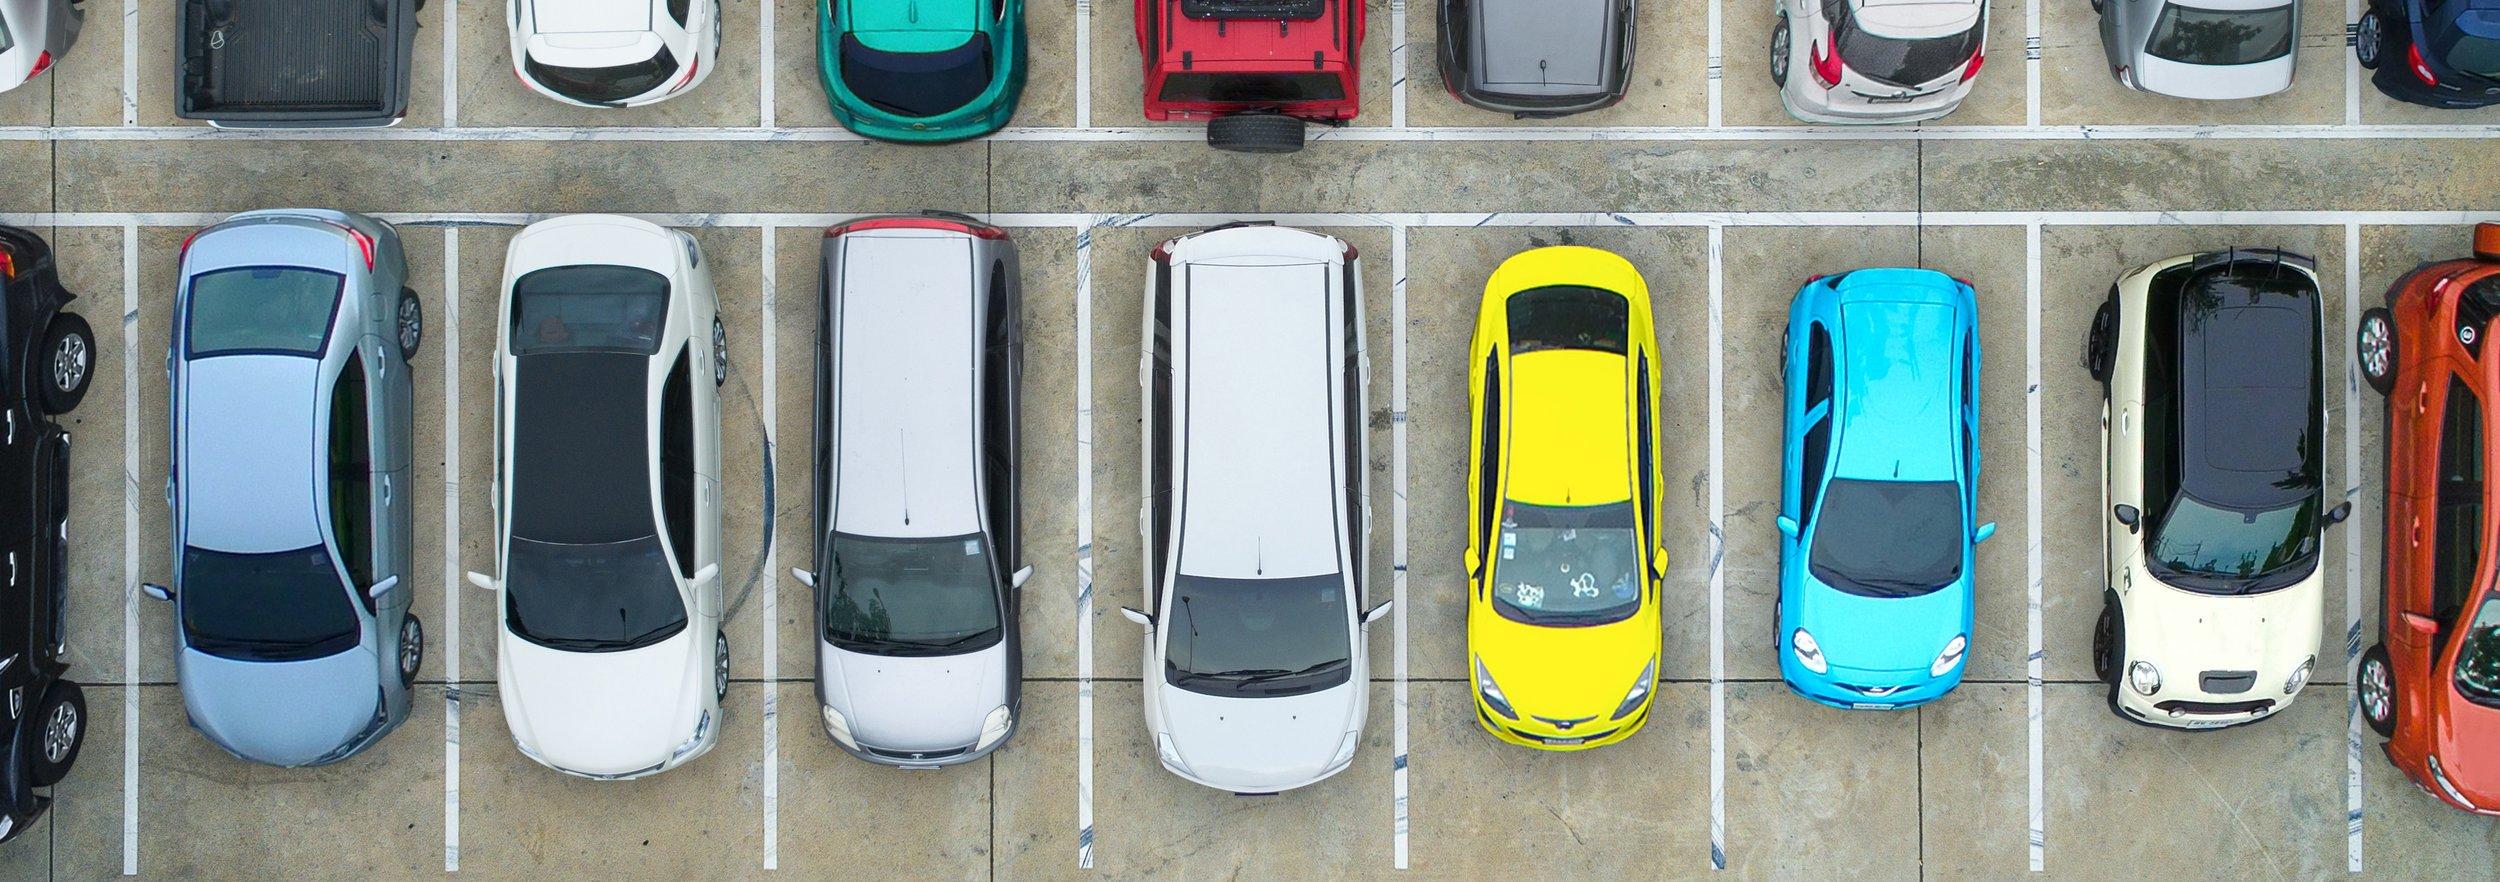 carparkingcrop.jpg